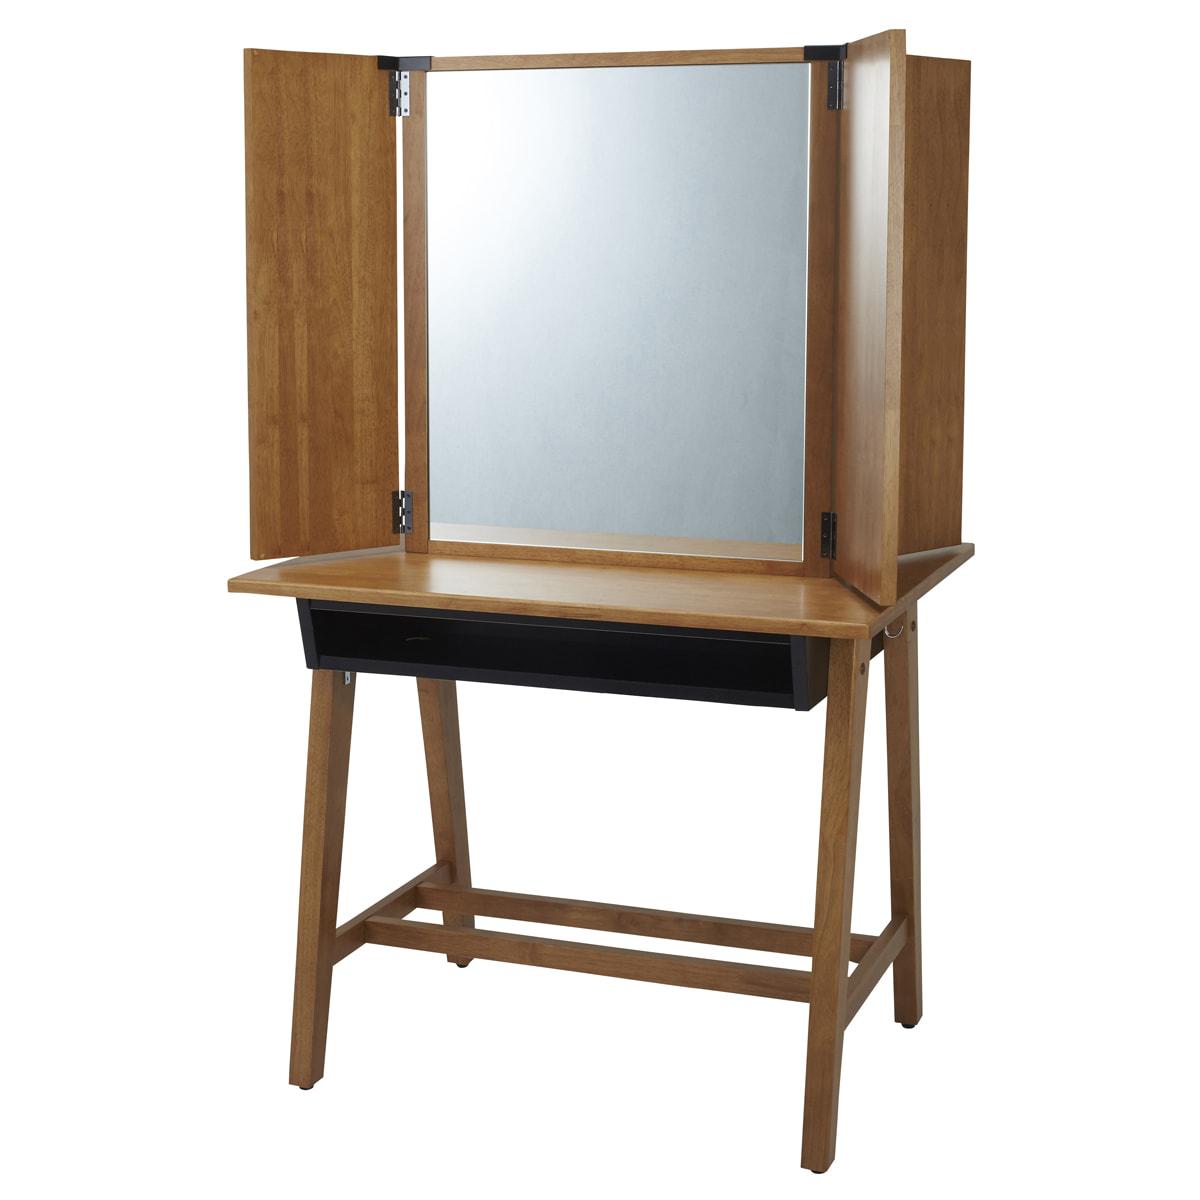 GRAIN(グレイン)天然木製両面ドレッサー(扉付き)